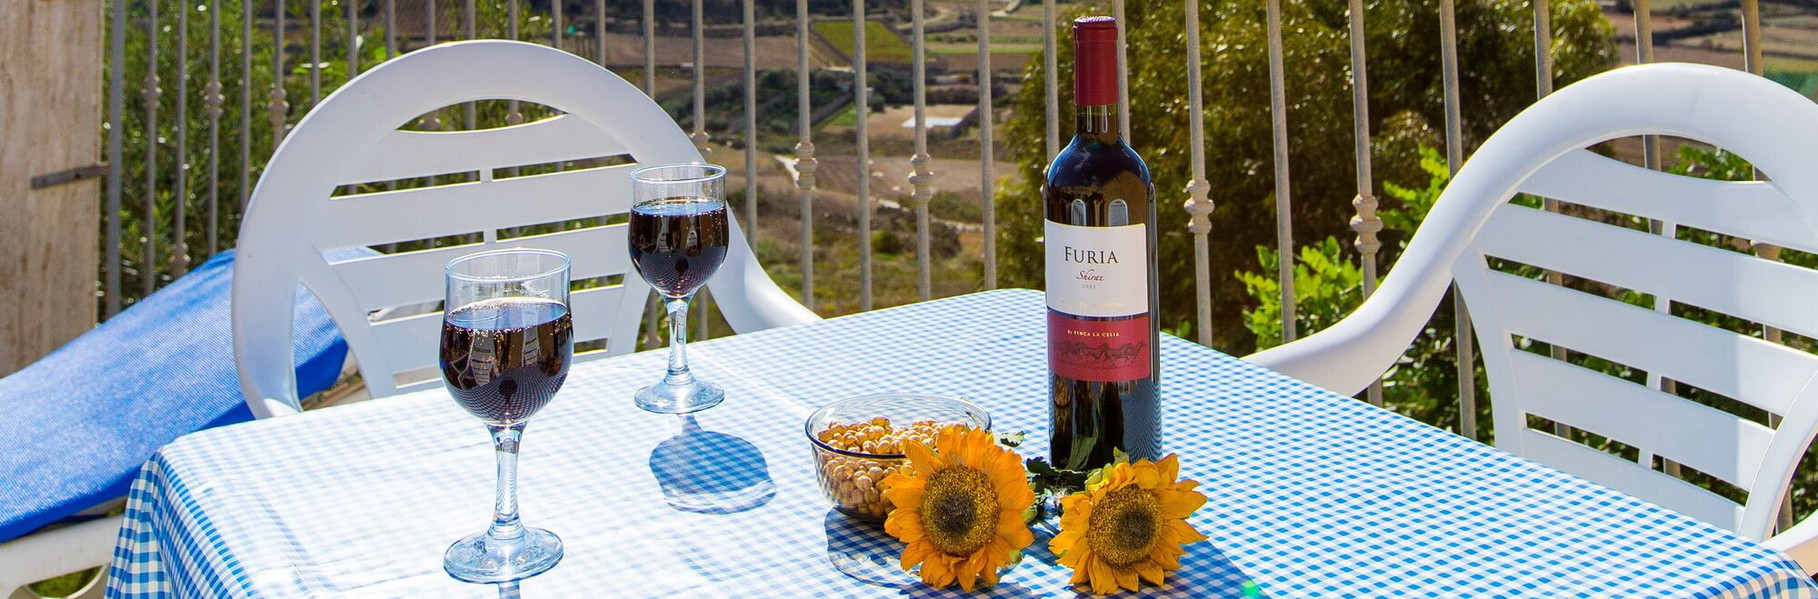 wine-and-view.jpg